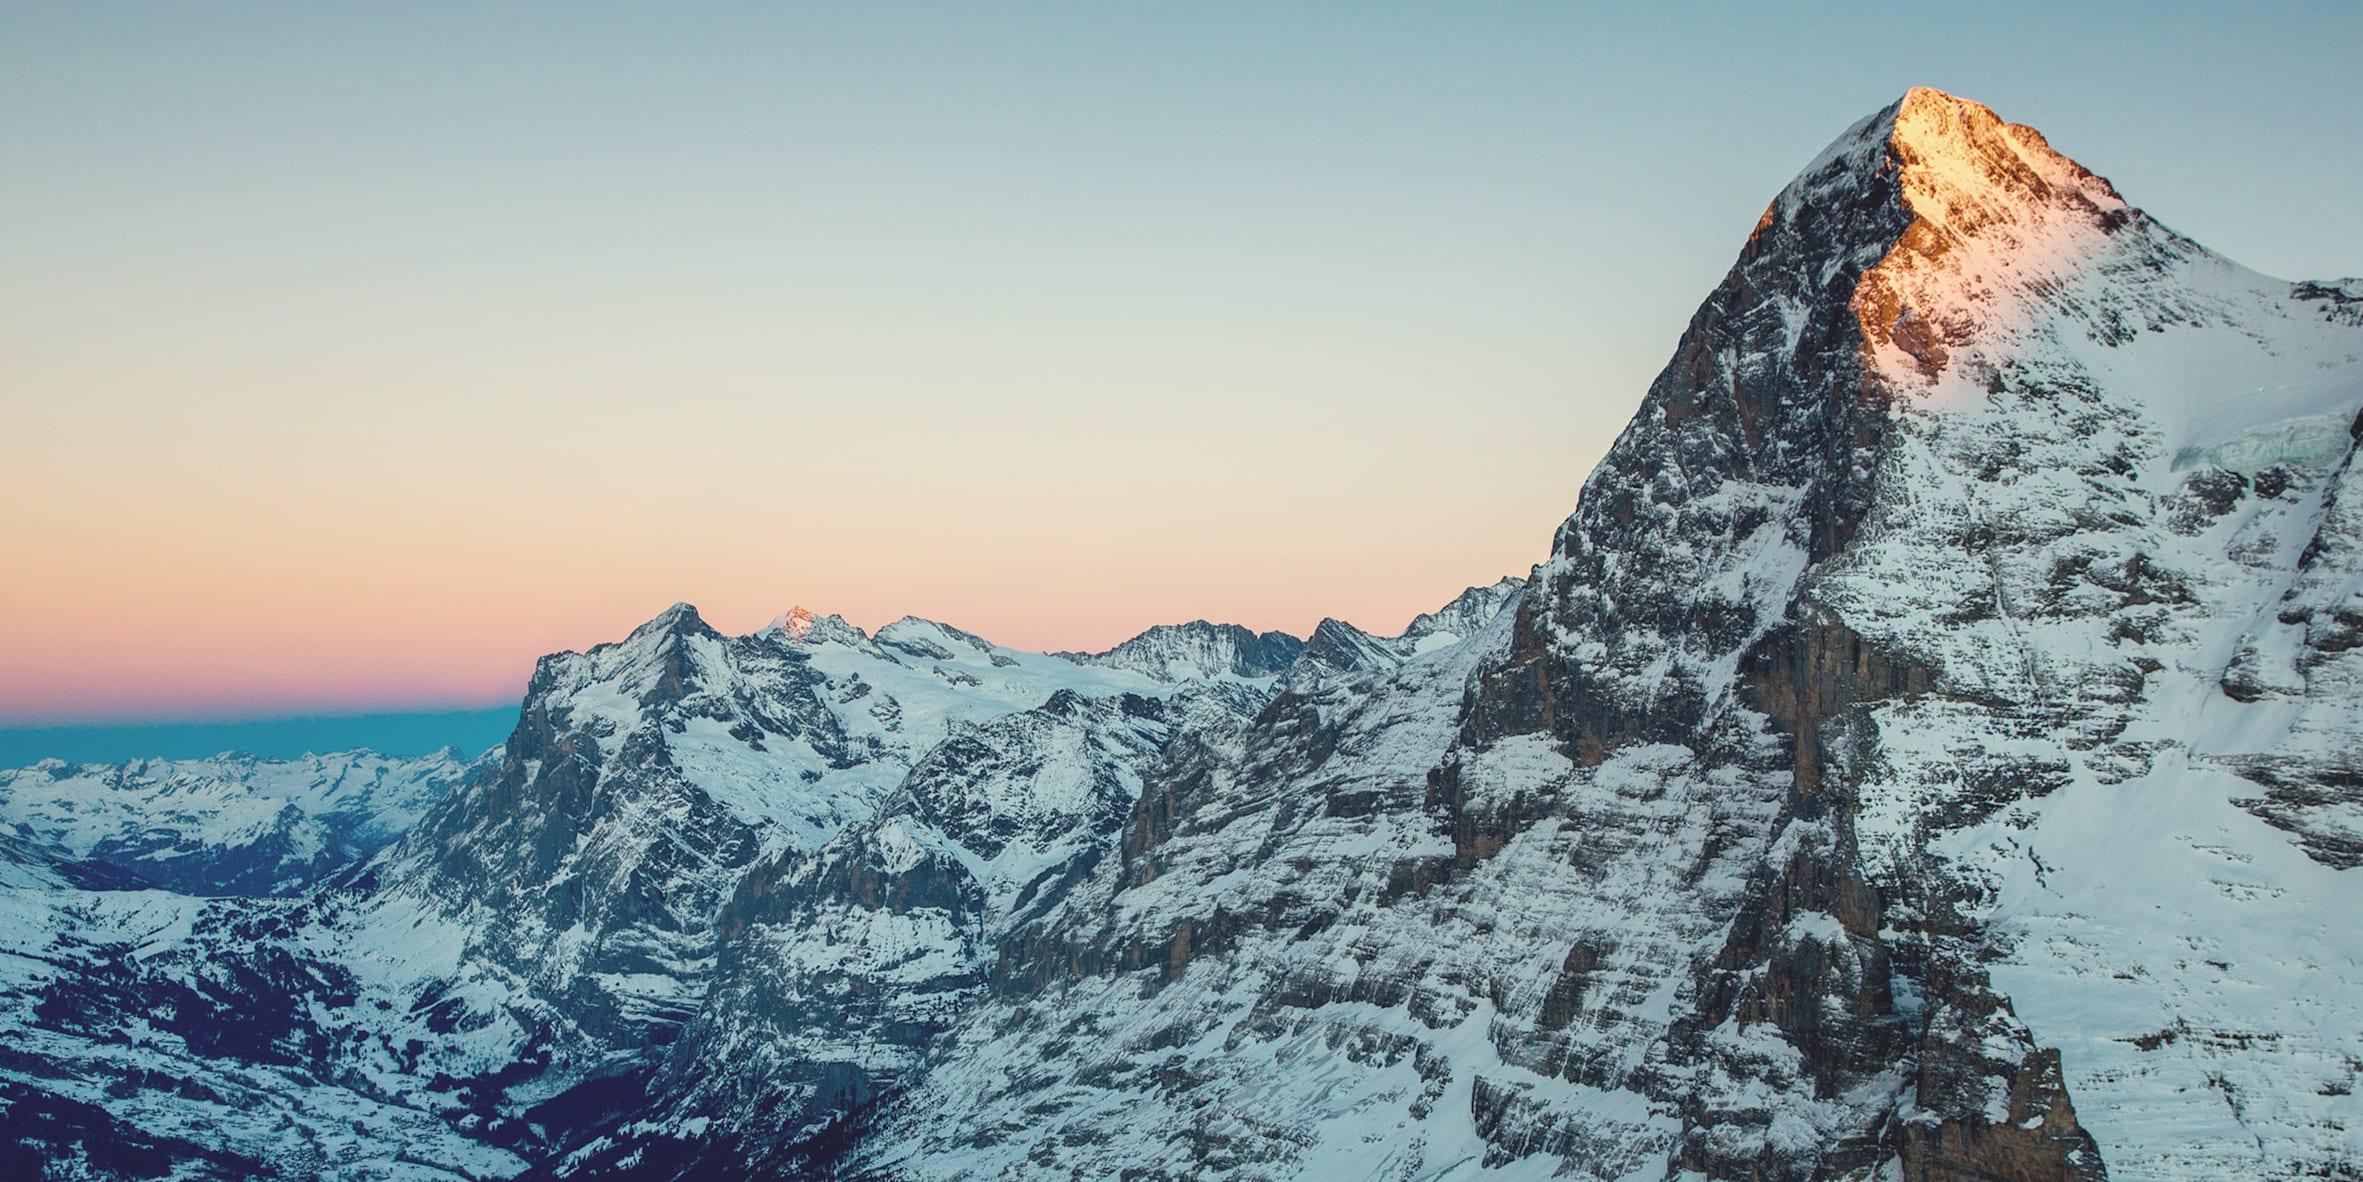 Eiger Grindelwald Winter